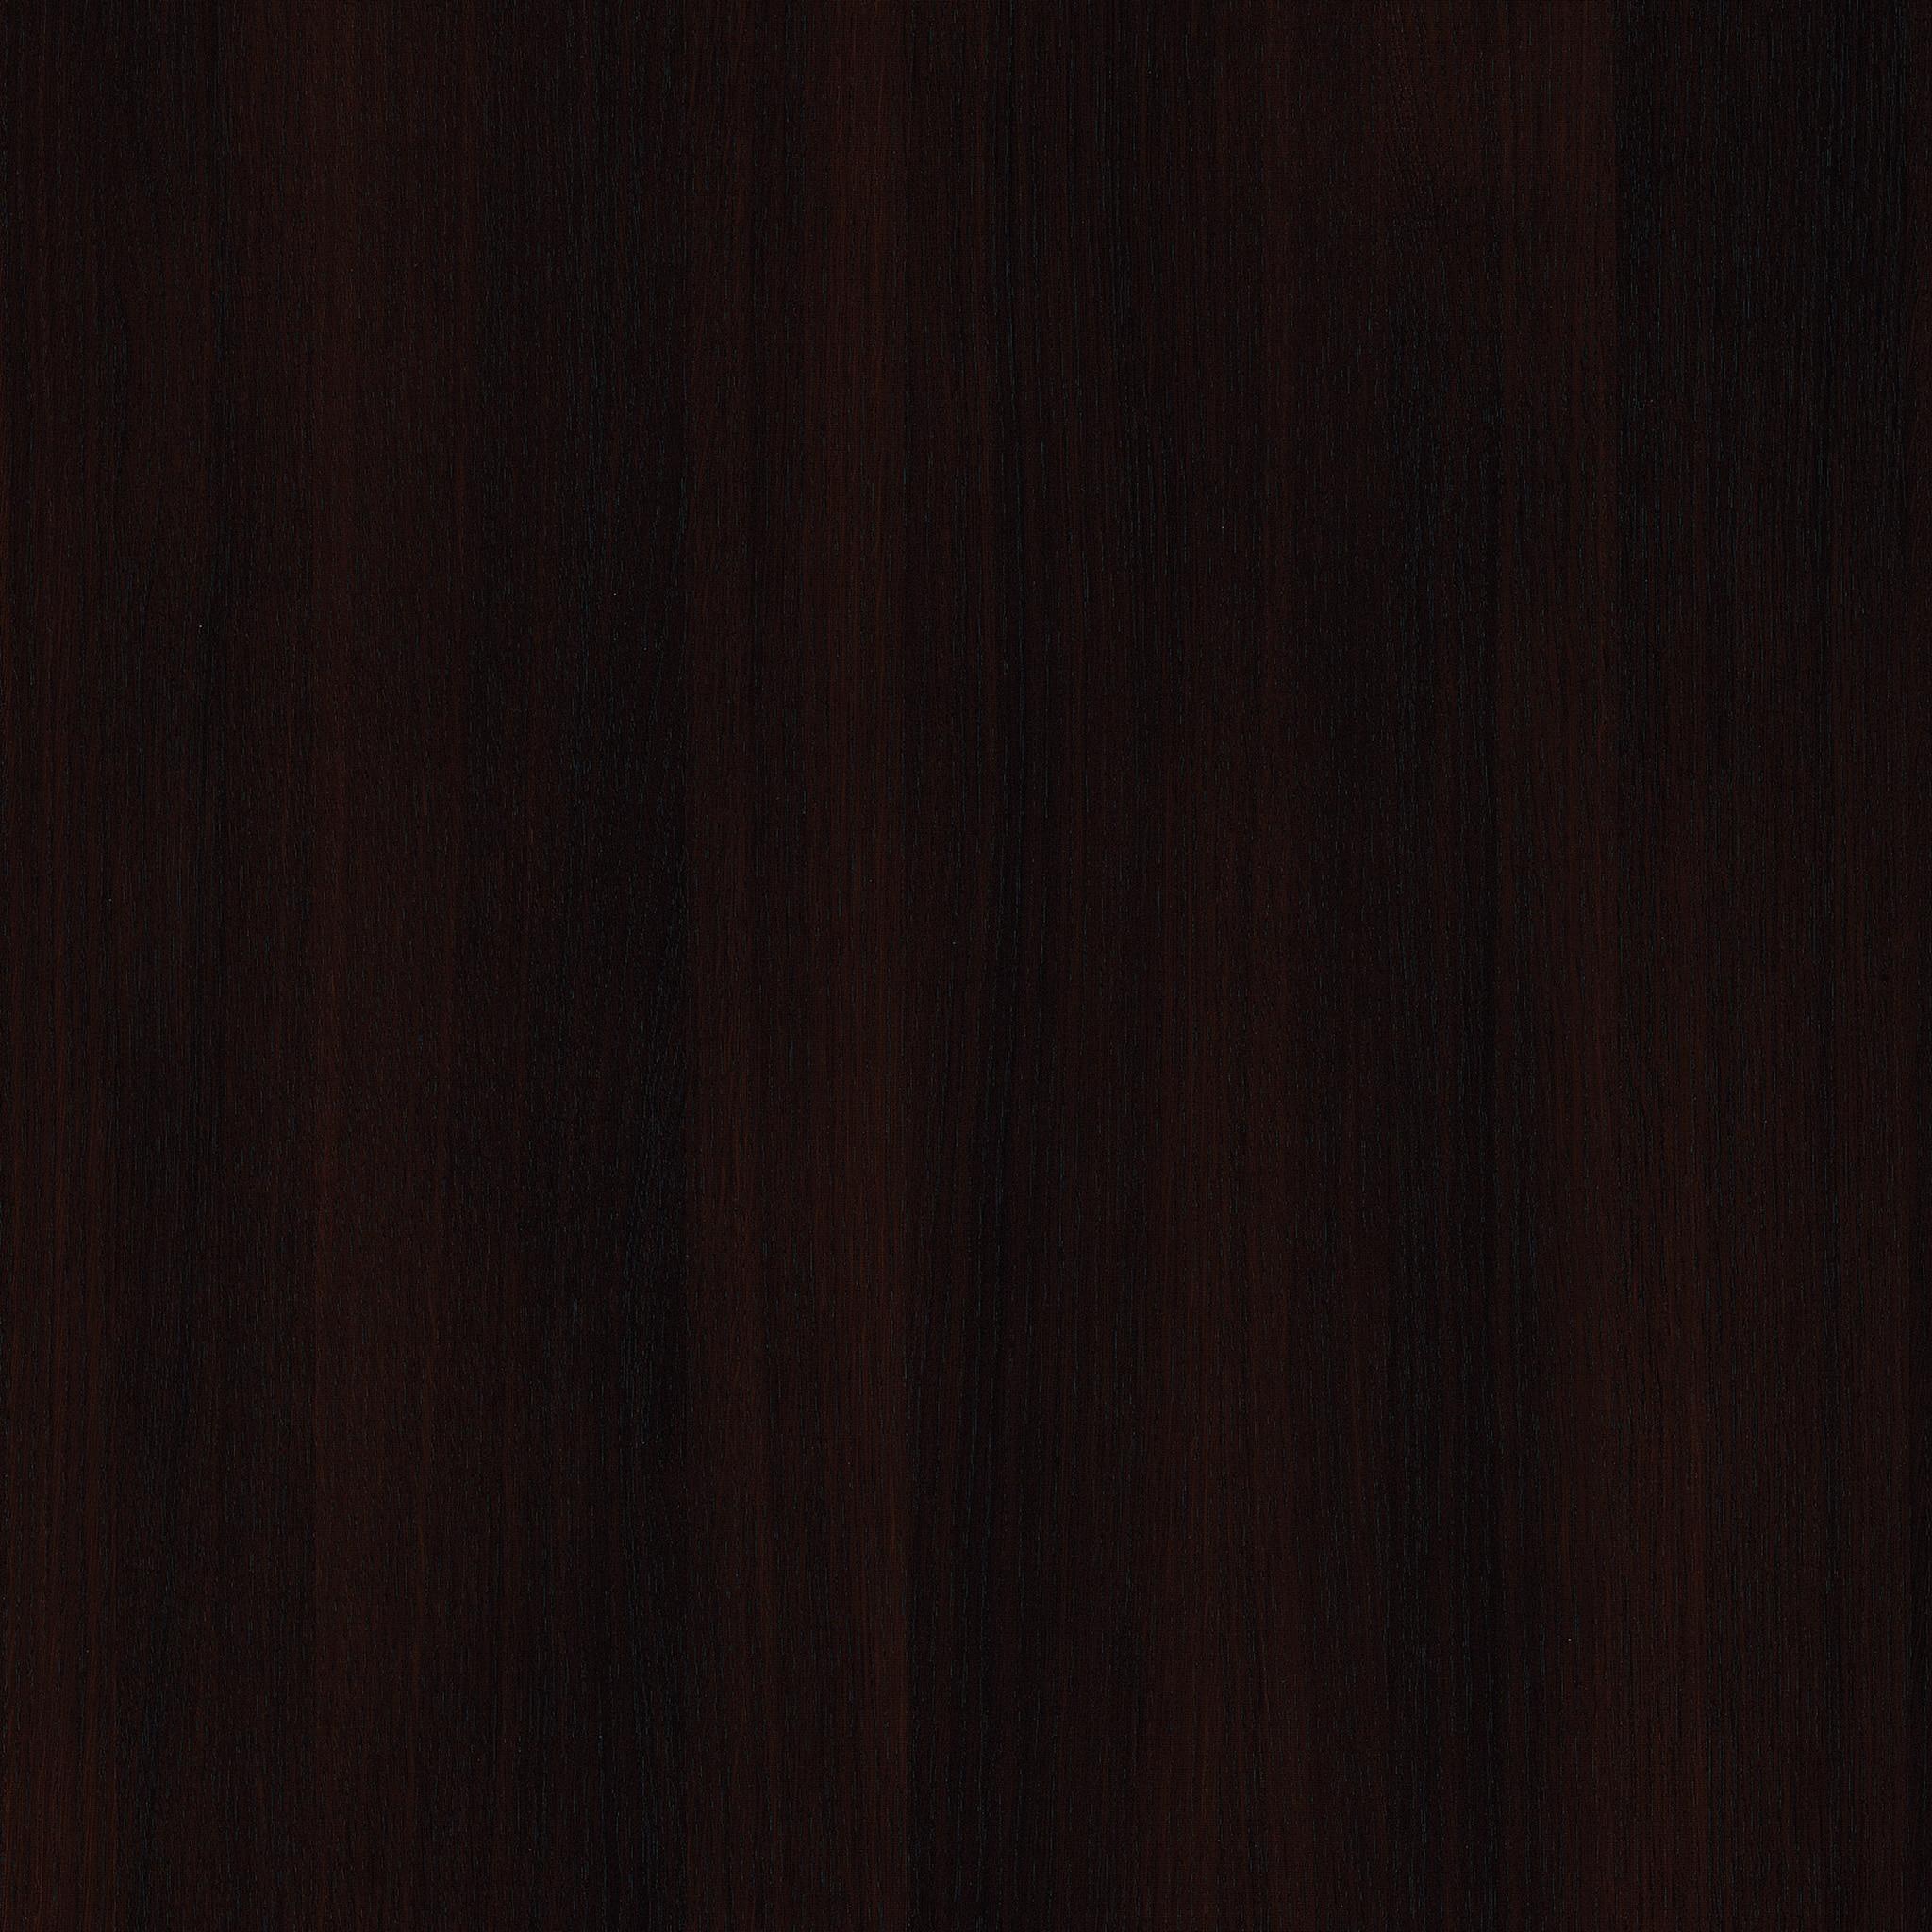 H1137 ST12 Sorano eik zwartbruin  Image